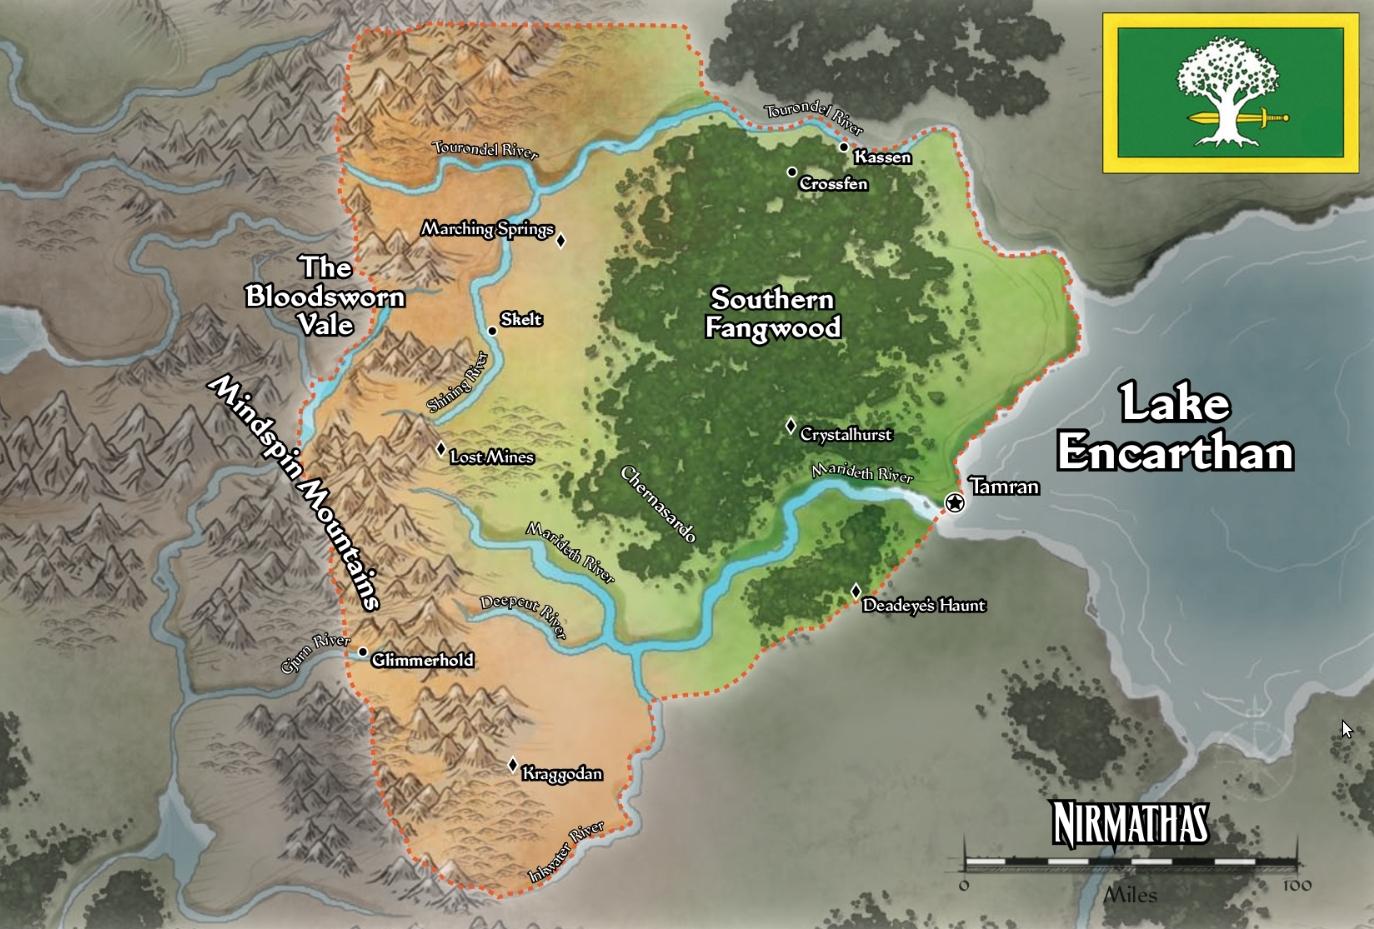 Nirmathas map